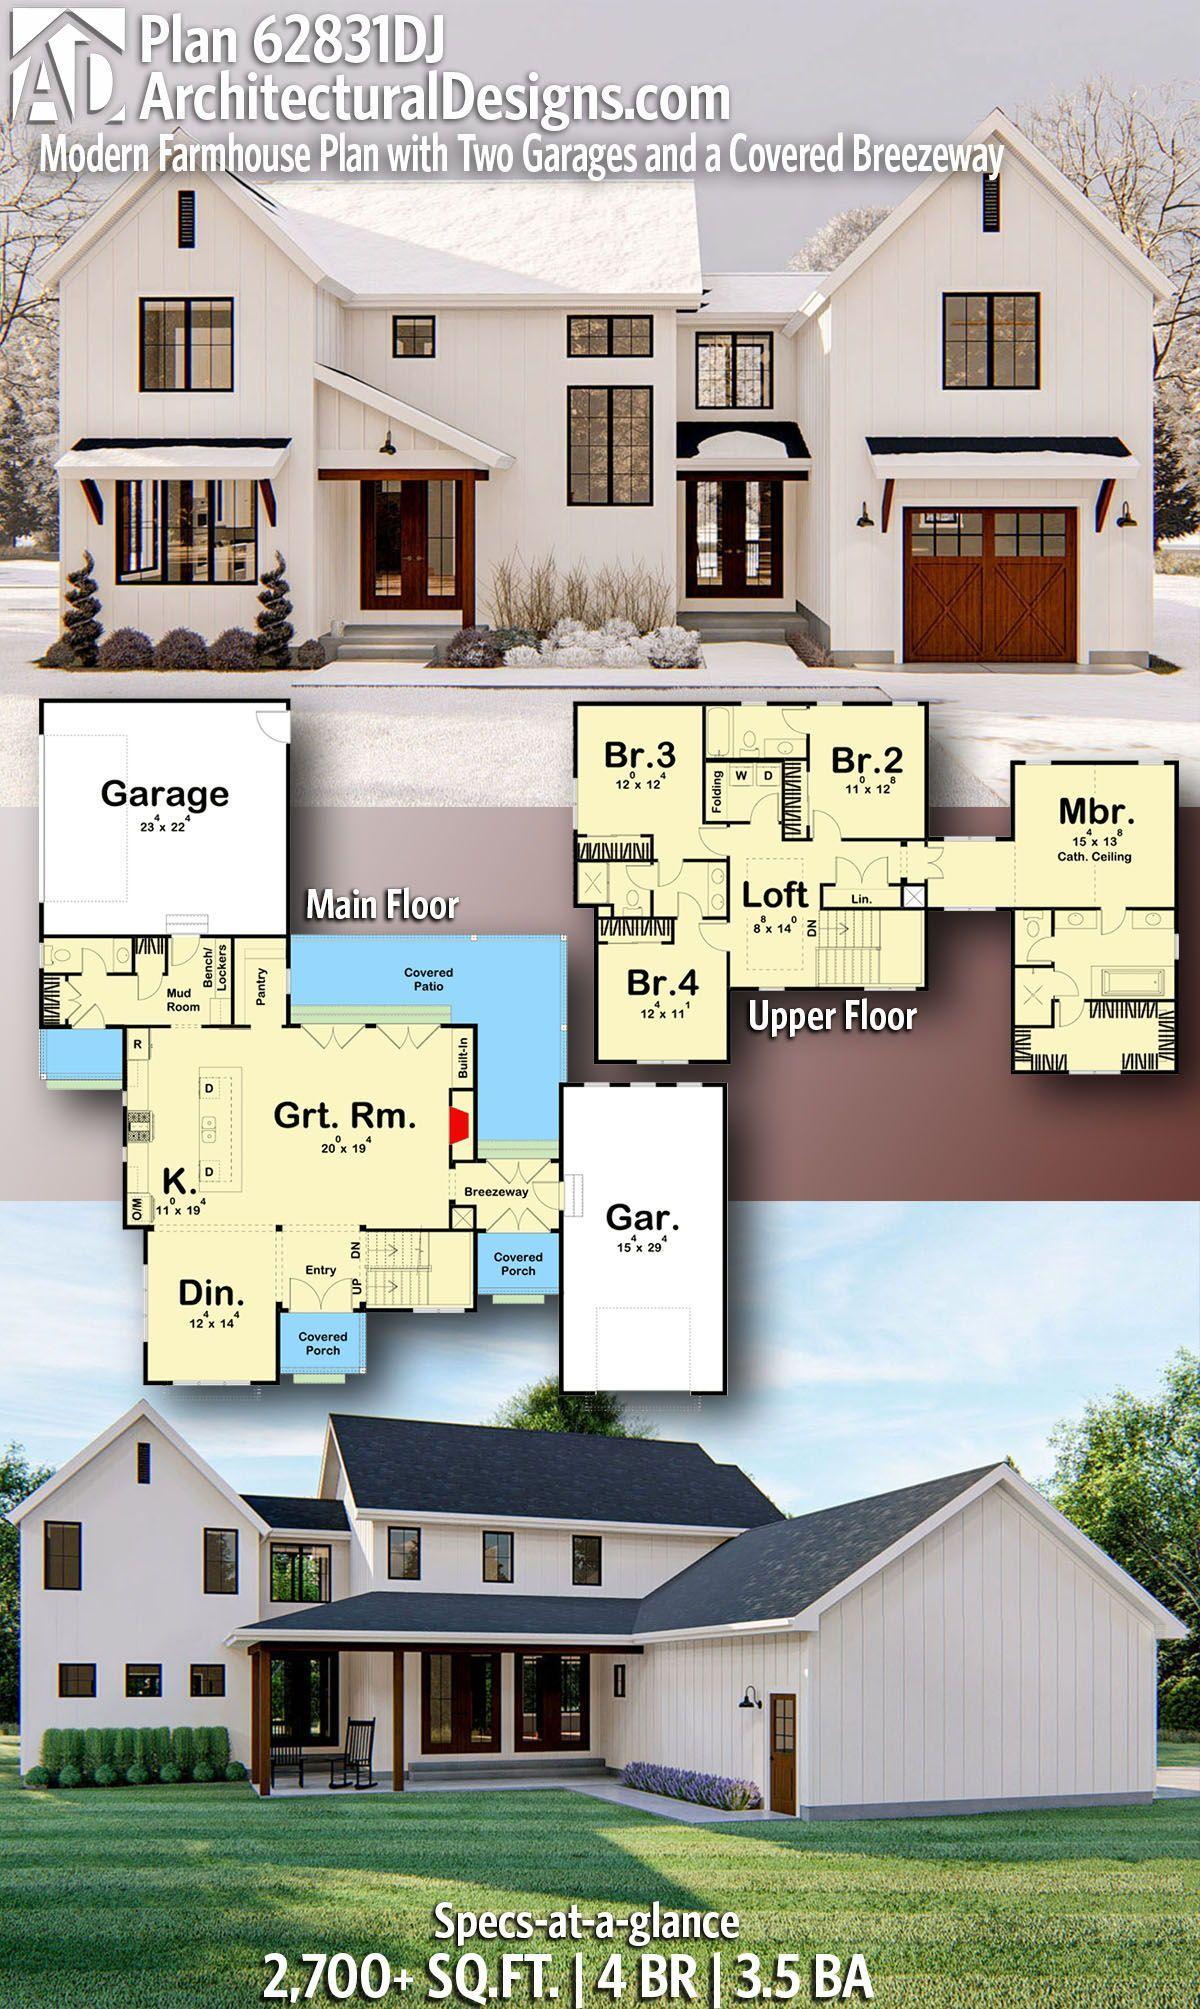 Modern Farmhouse Plans House Plans Farmhouse House Plans Farmhouse Plans House Bluepr In 2020 Modern Farmhouse Plans House Plans Farmhouse Sims House Plans